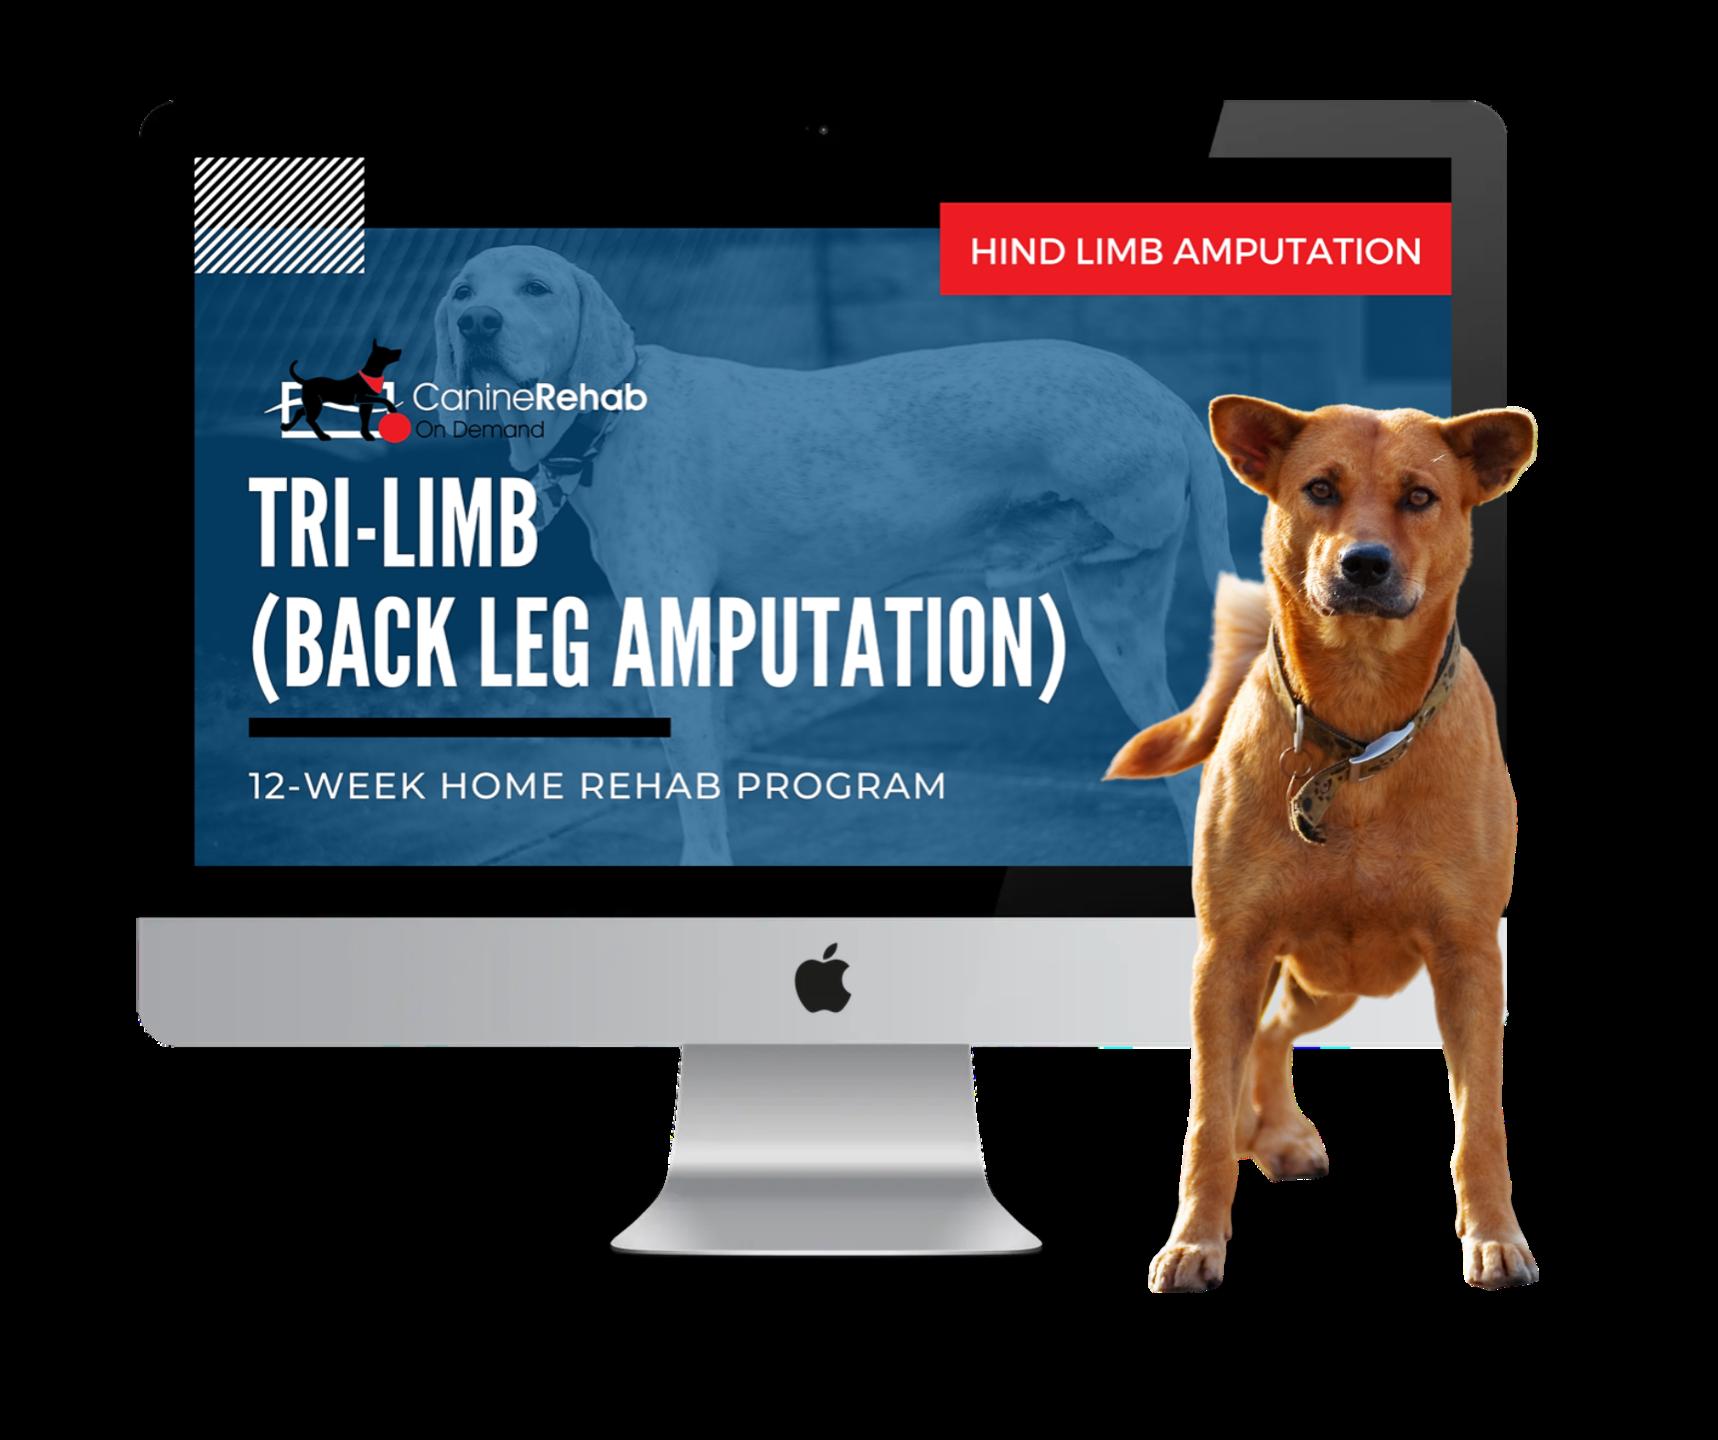 Back Leg Amputation 12-Week Home Rehab Program